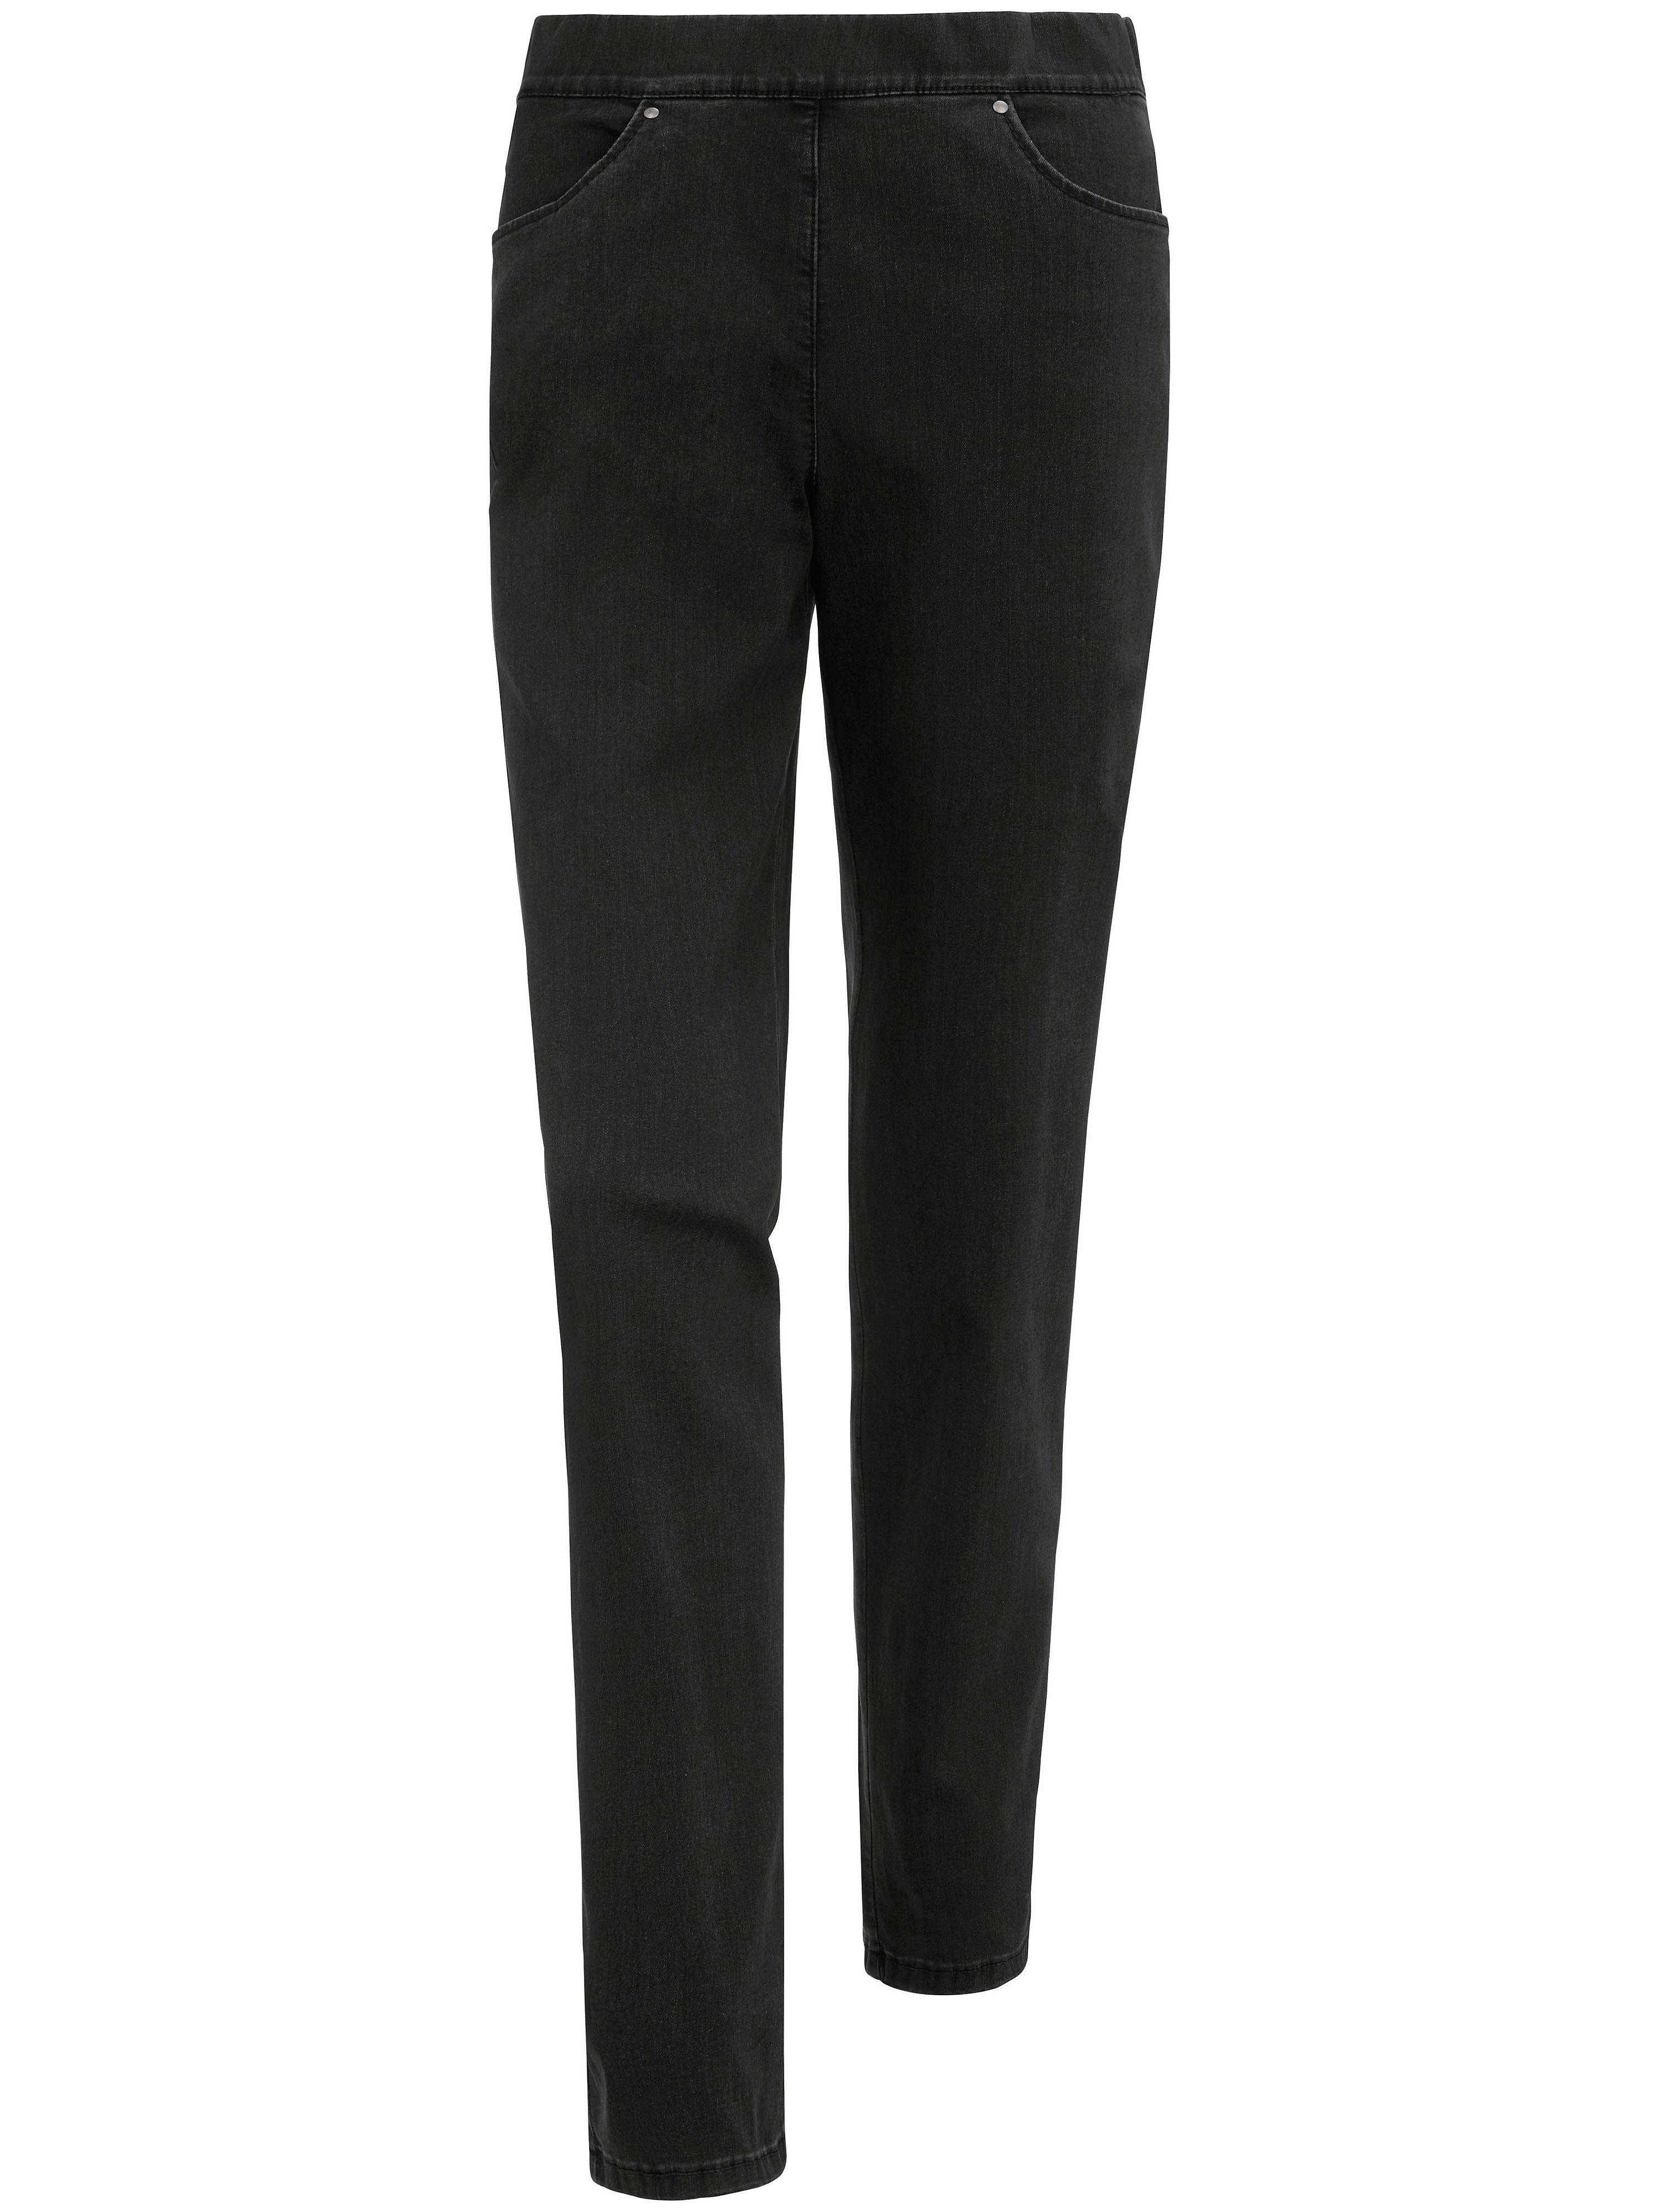 Image of   Bekvemme jeans Fra Peter Hahn sort